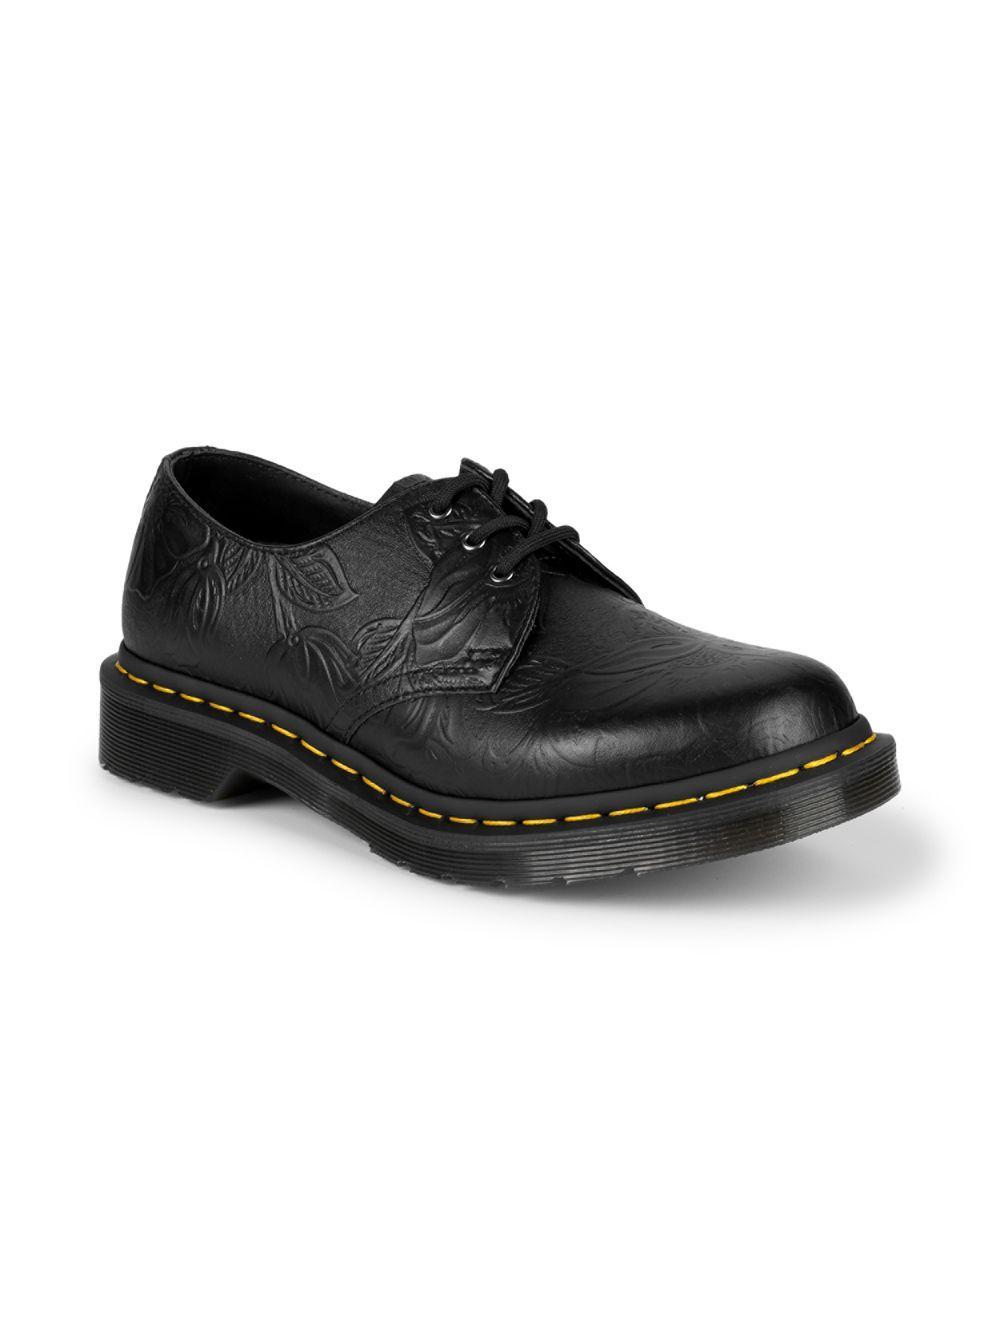 a3e0539bcefa8 Dr. Martens - Black 1461 Floral Embossed Leather Derby Shoes for Men - Lyst.  View fullscreen